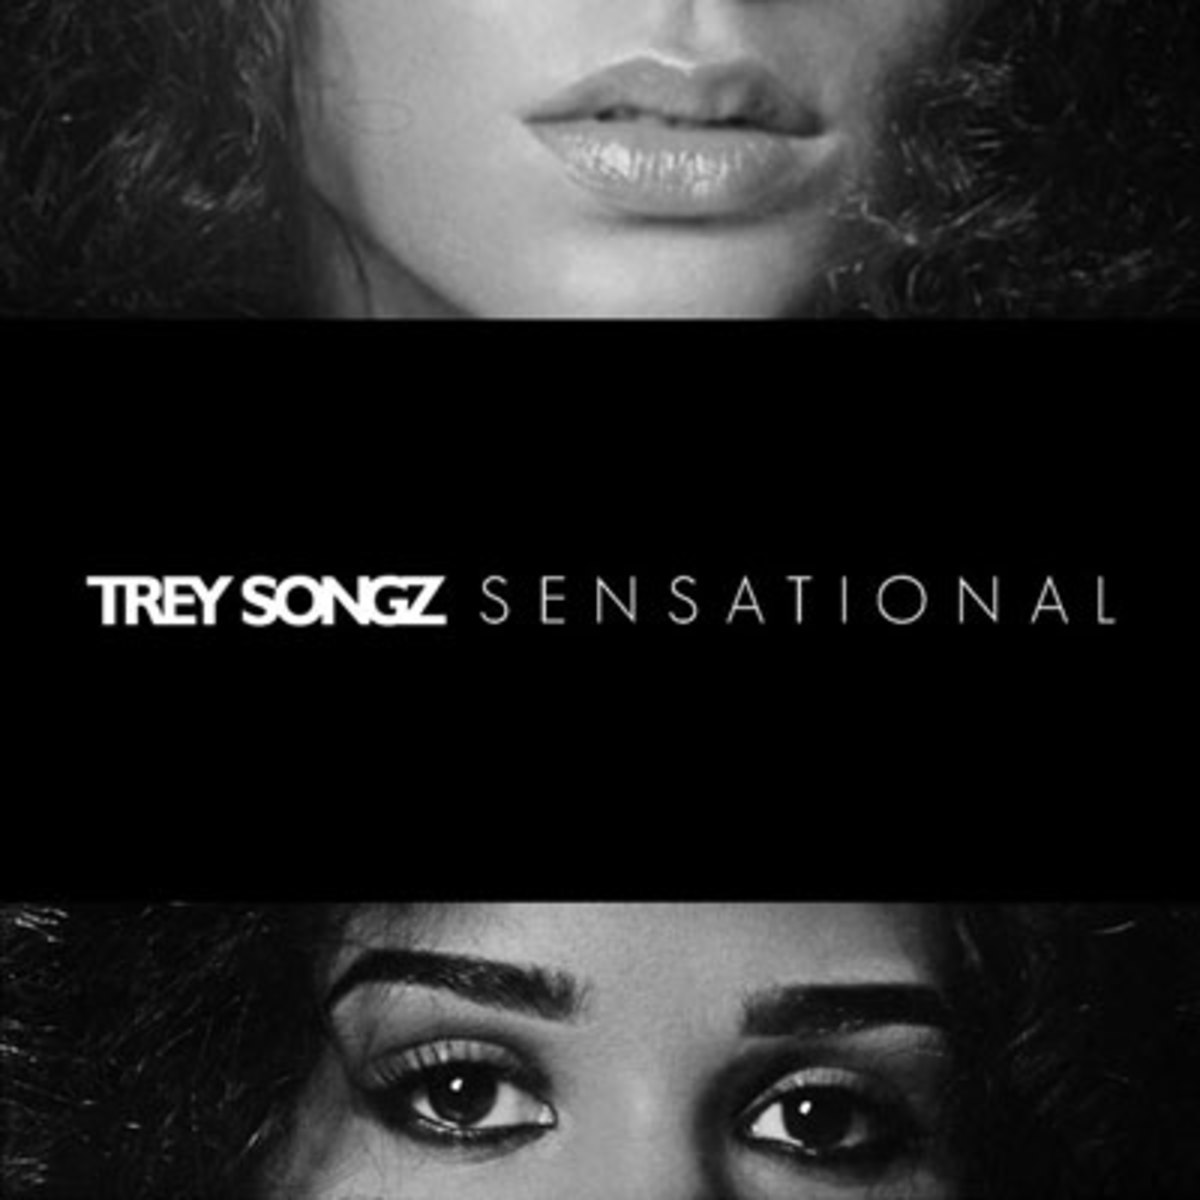 treysongz-sensational.jpg